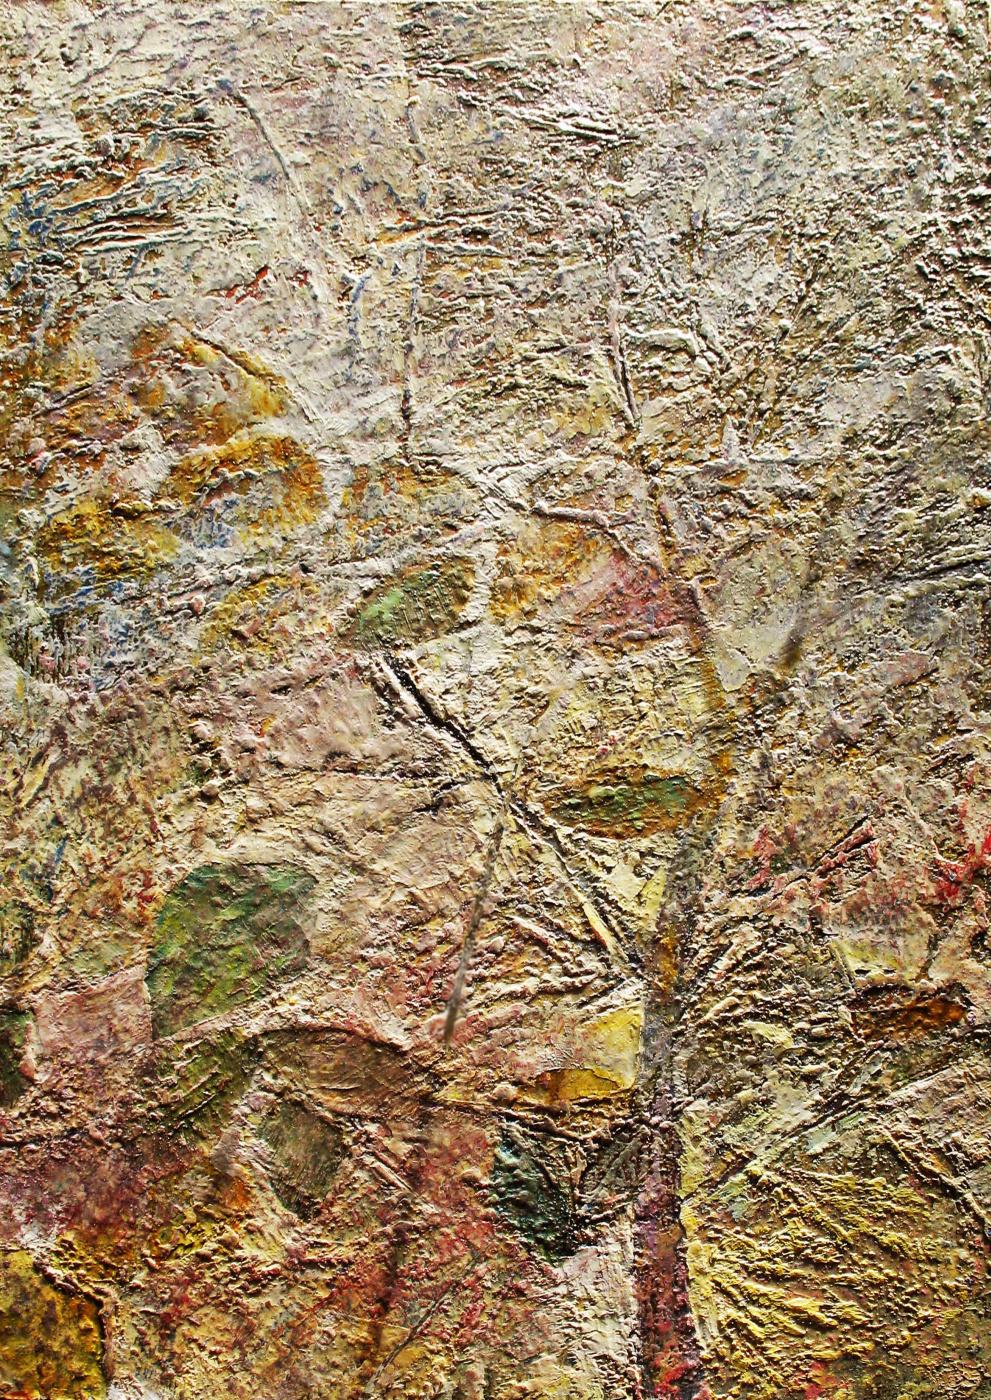 Alexander Ivanovich Vlasyuk. Foliage patterned shadow